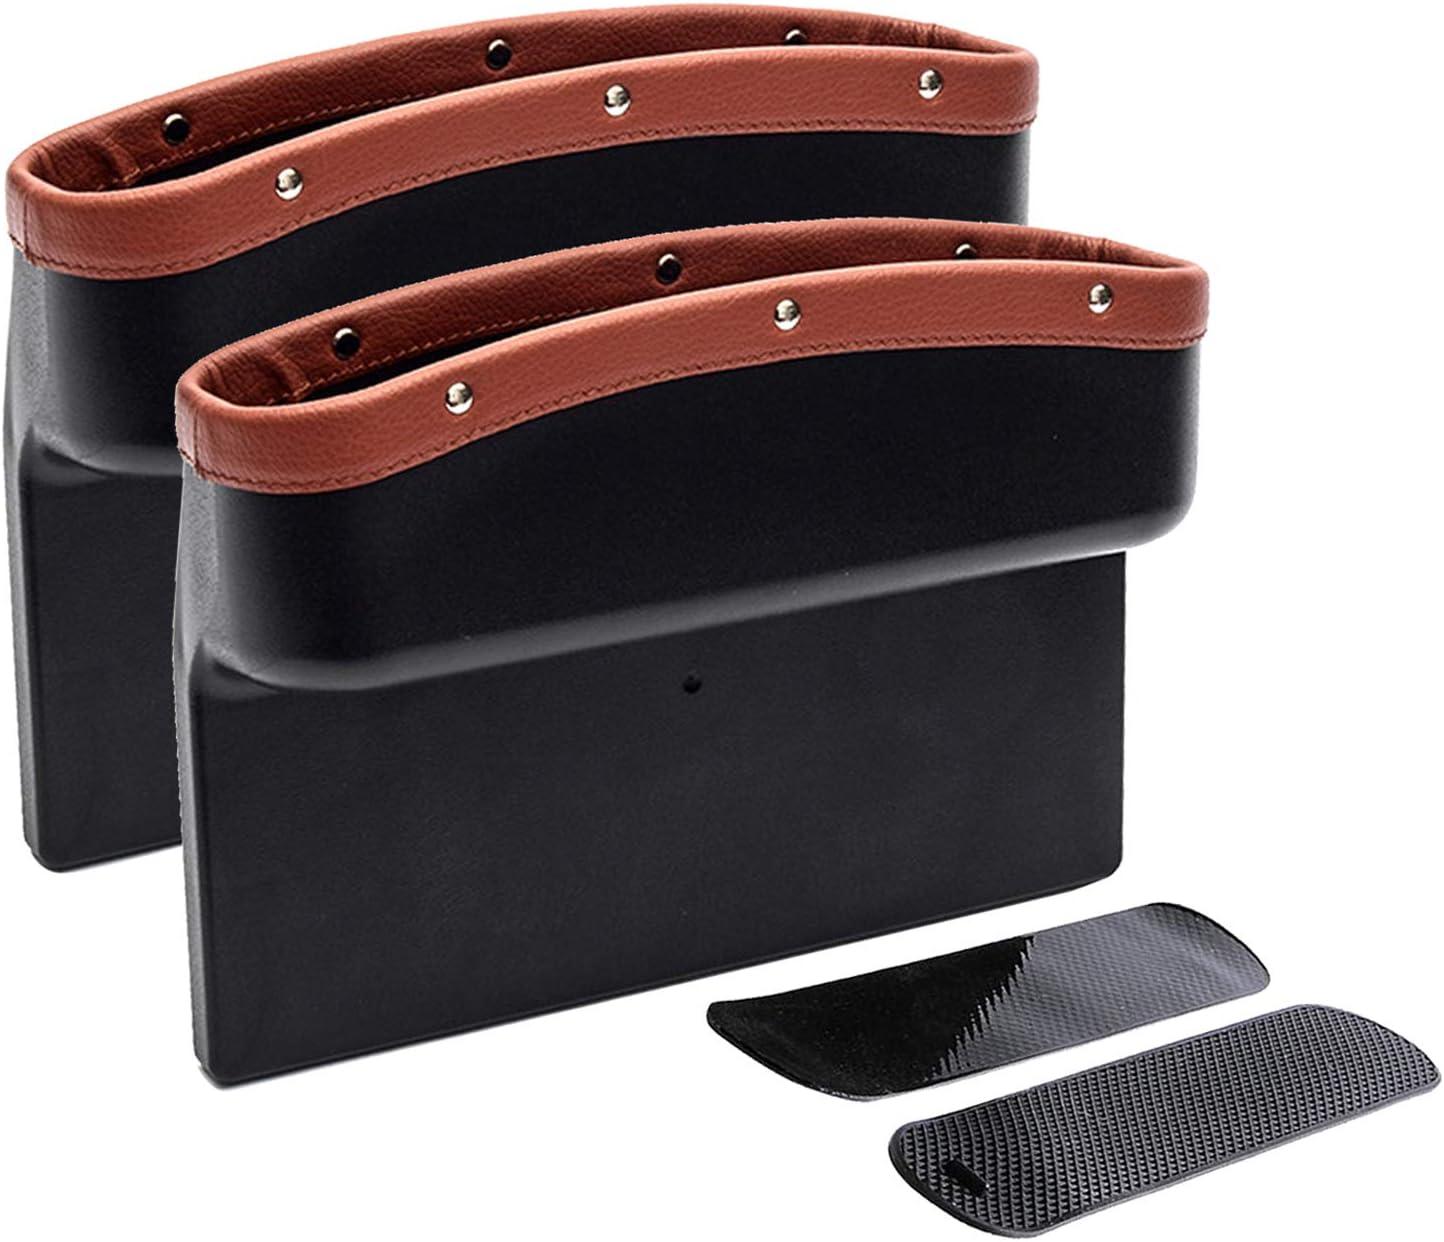 EZEYU TLitdr Car Seat Gap Filler Organizer,2 Pack PU Car Gap Filler Non-Slip Organizer with 2 Non-Slip Mat Multi-Functional Storage Box for Cellphone Wallet Coin Key Black//Beige